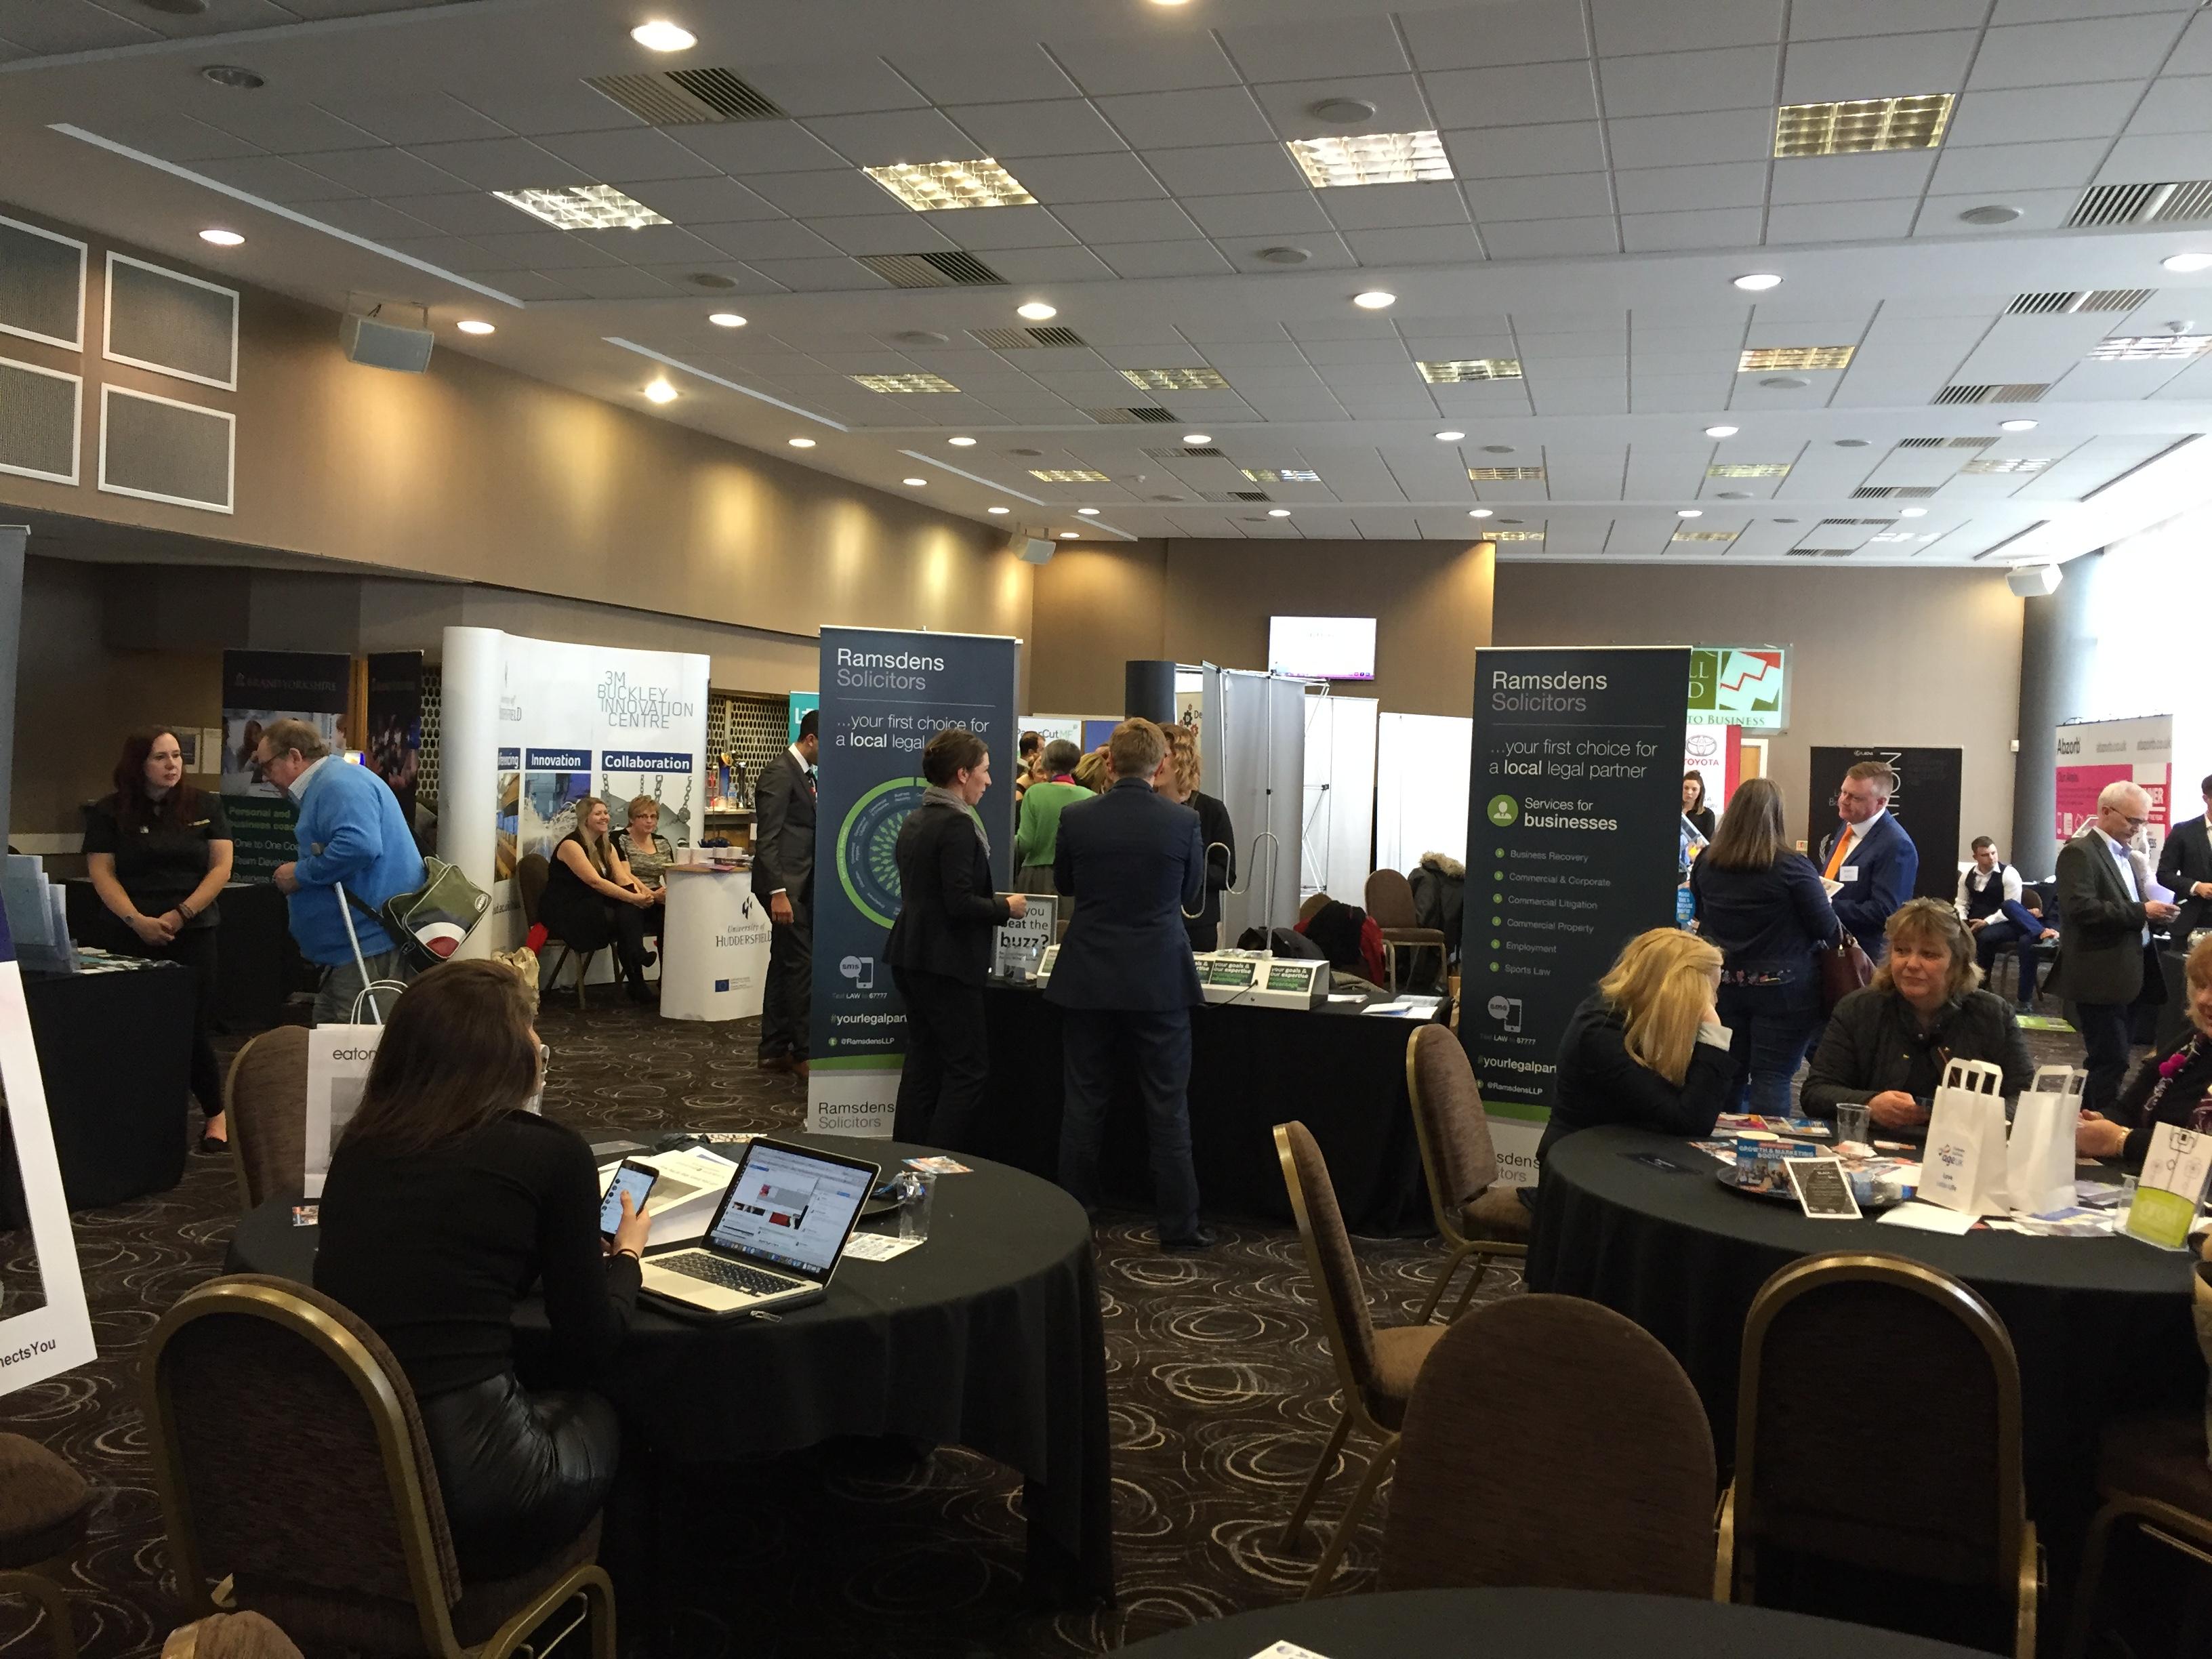 Social Progress Ltd - Kirklees Business Conference #MYCK16 - Mid Yorkshire Chamber of Commerce - John Smith's Stadium, Huddersfield